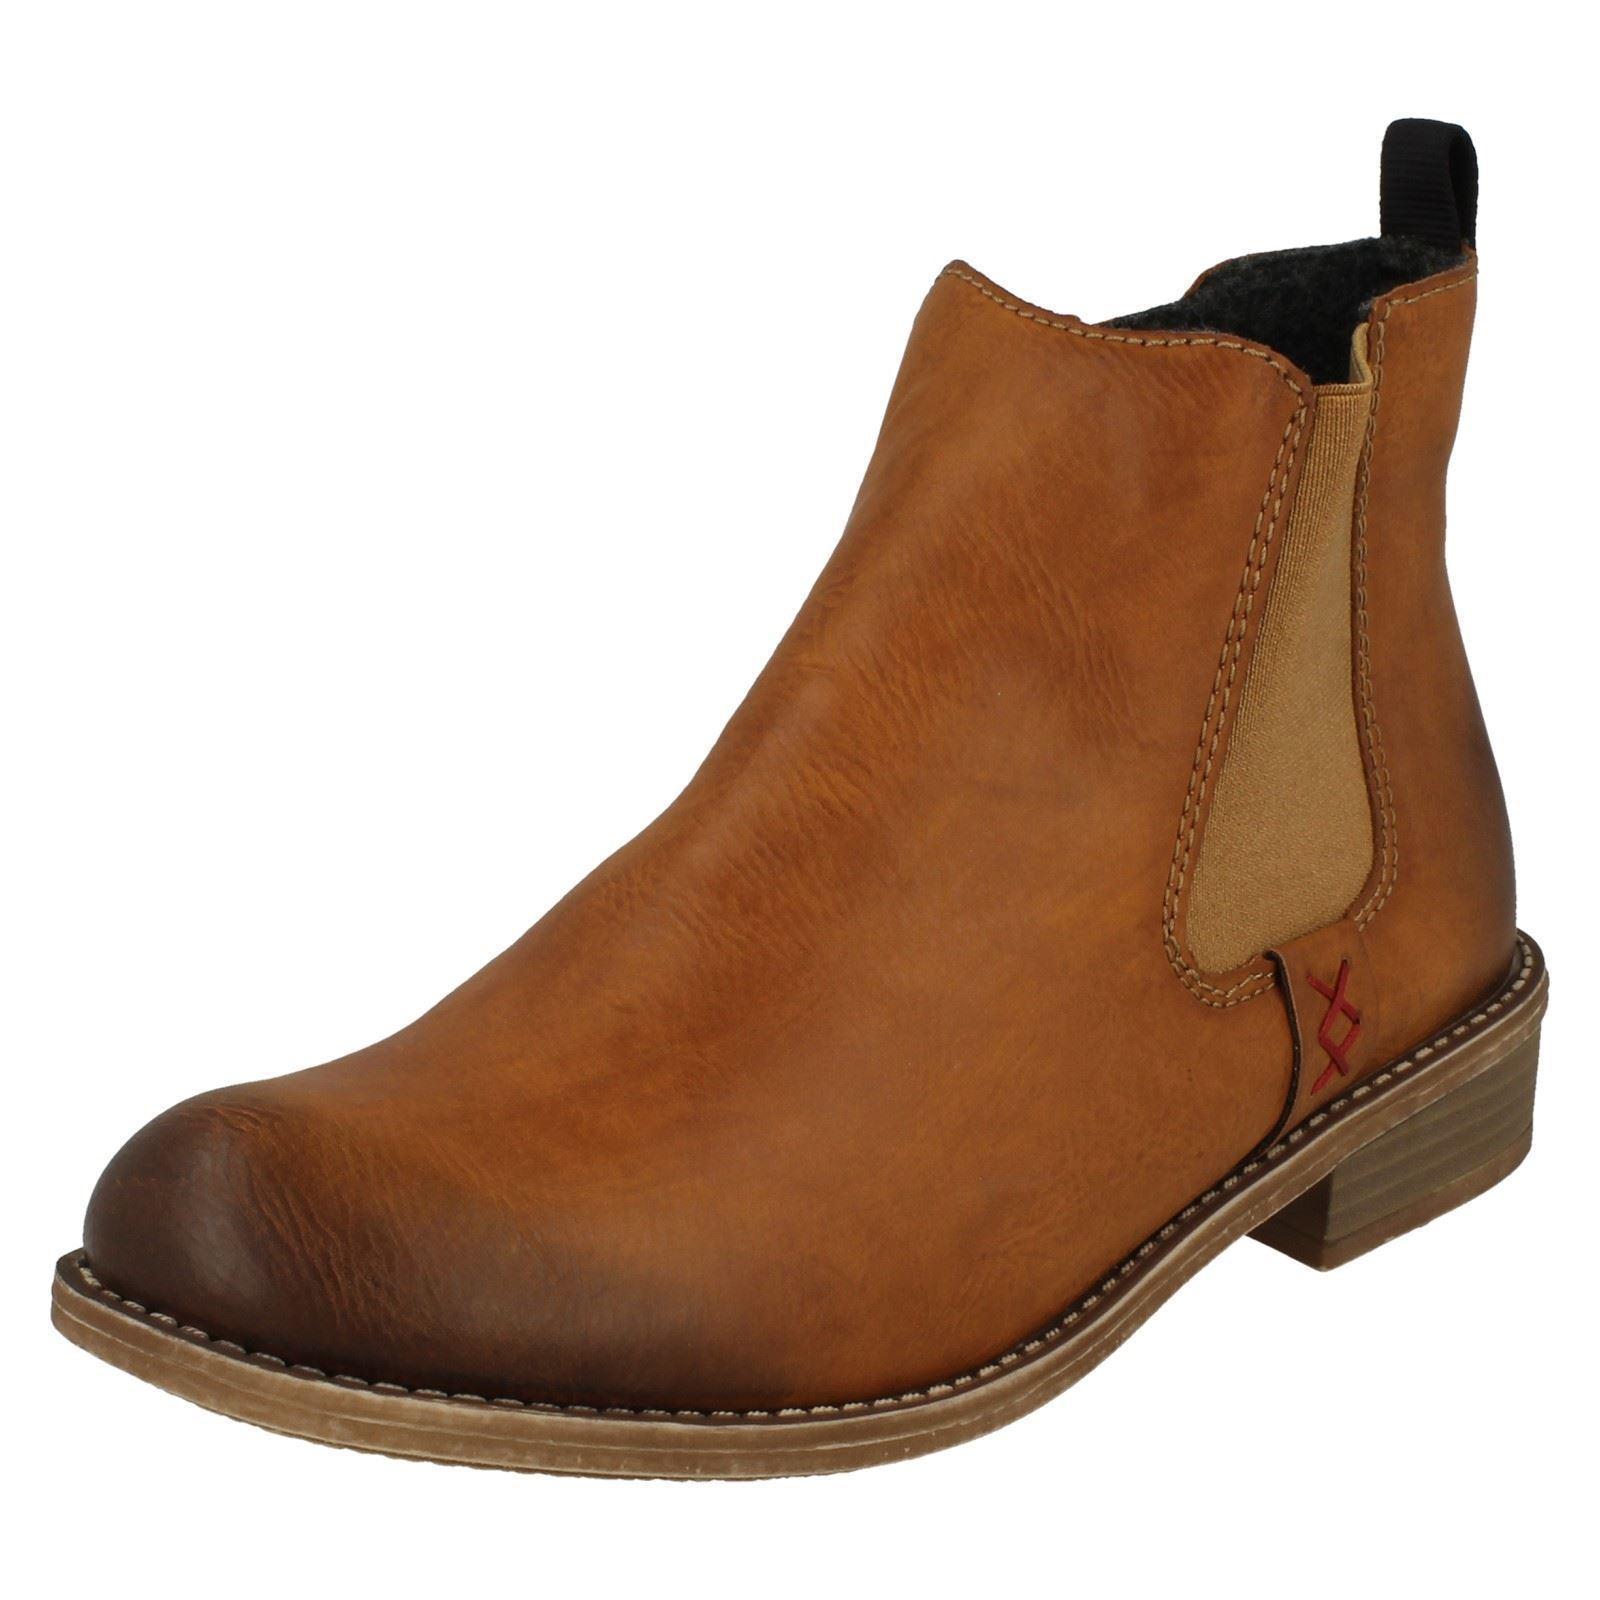 Ebay Co Uk Barker Shoes